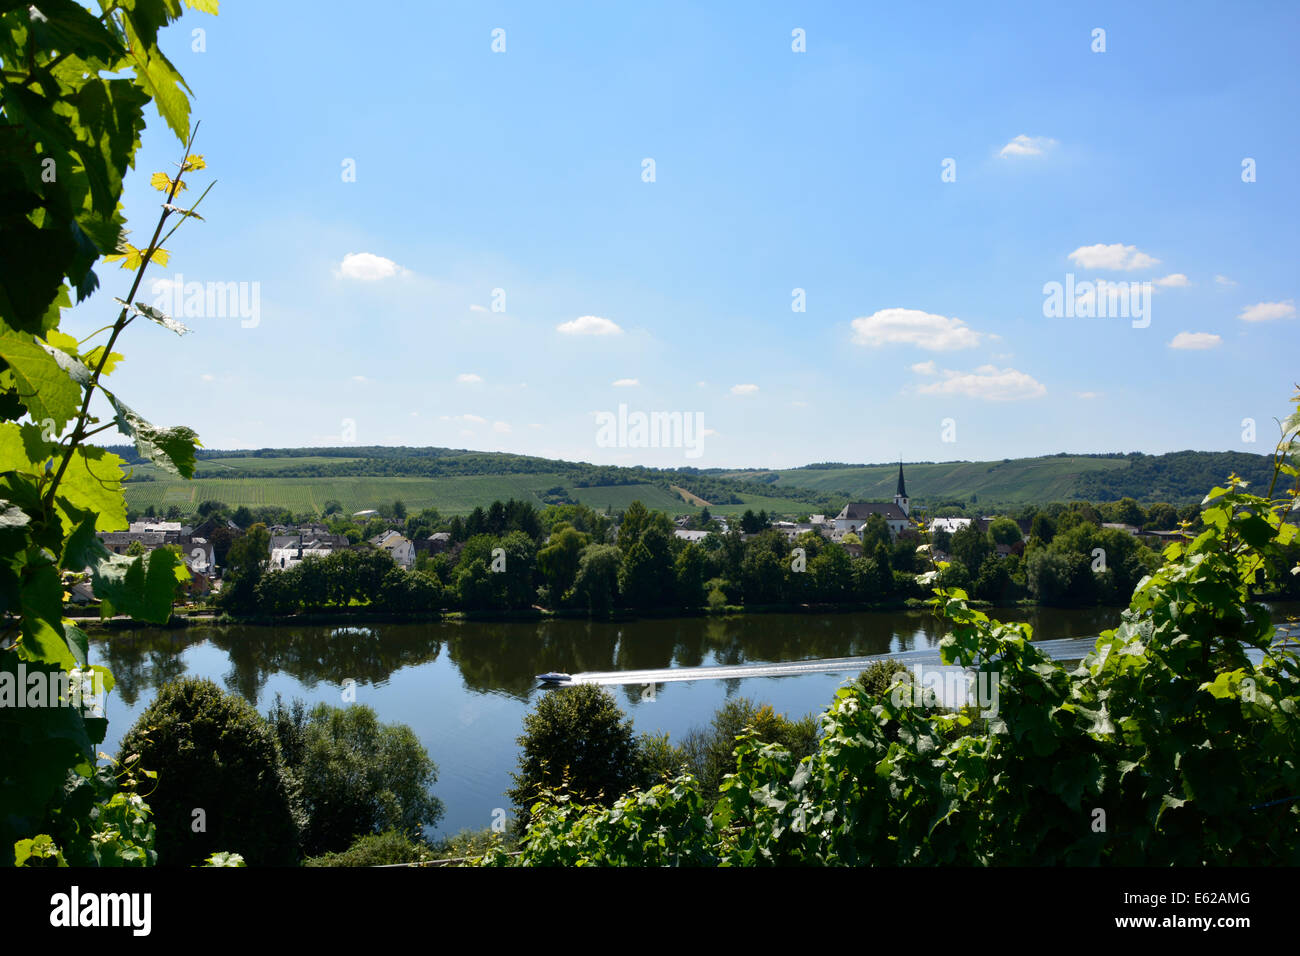 Paisaje del valle del río Mosela, Longuich con blue sky Alemania Mosel Römische Weinstrasse Schweich Moseltal blauer Himmel Fluss Foto de stock